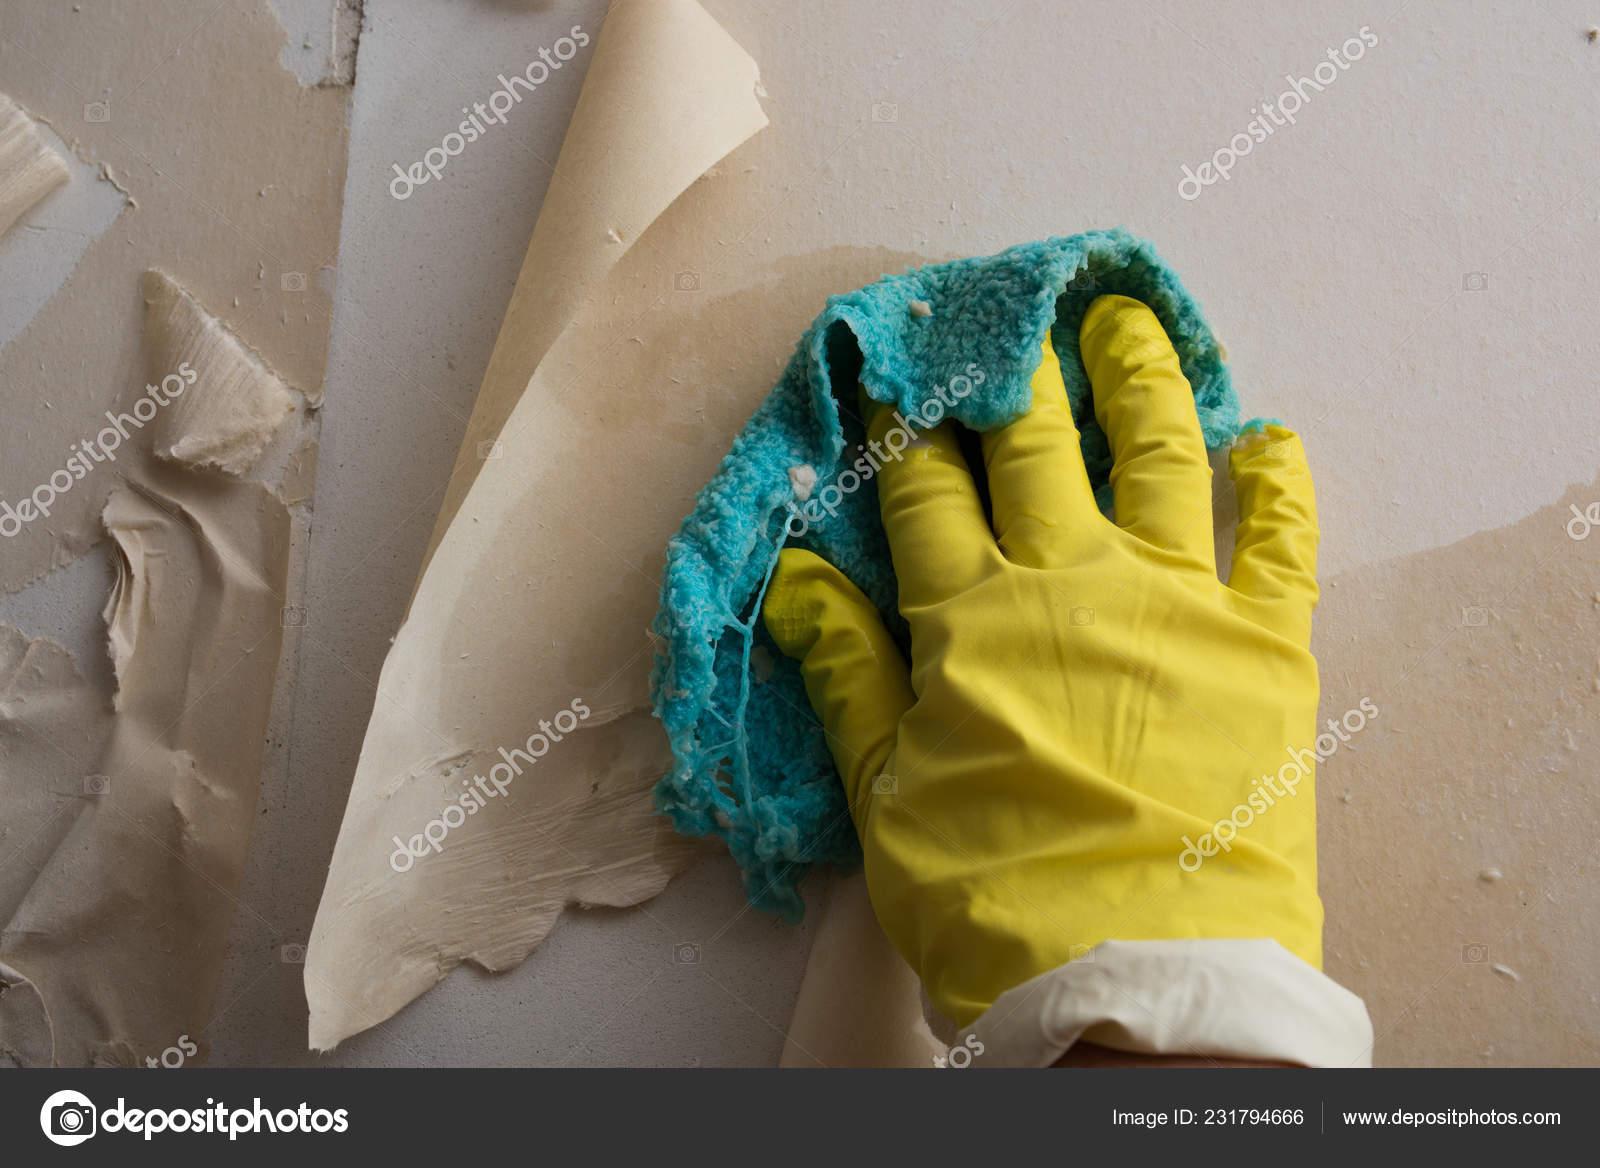 Preparing Wall Painting Sticking New Wallpaper Man Yellow